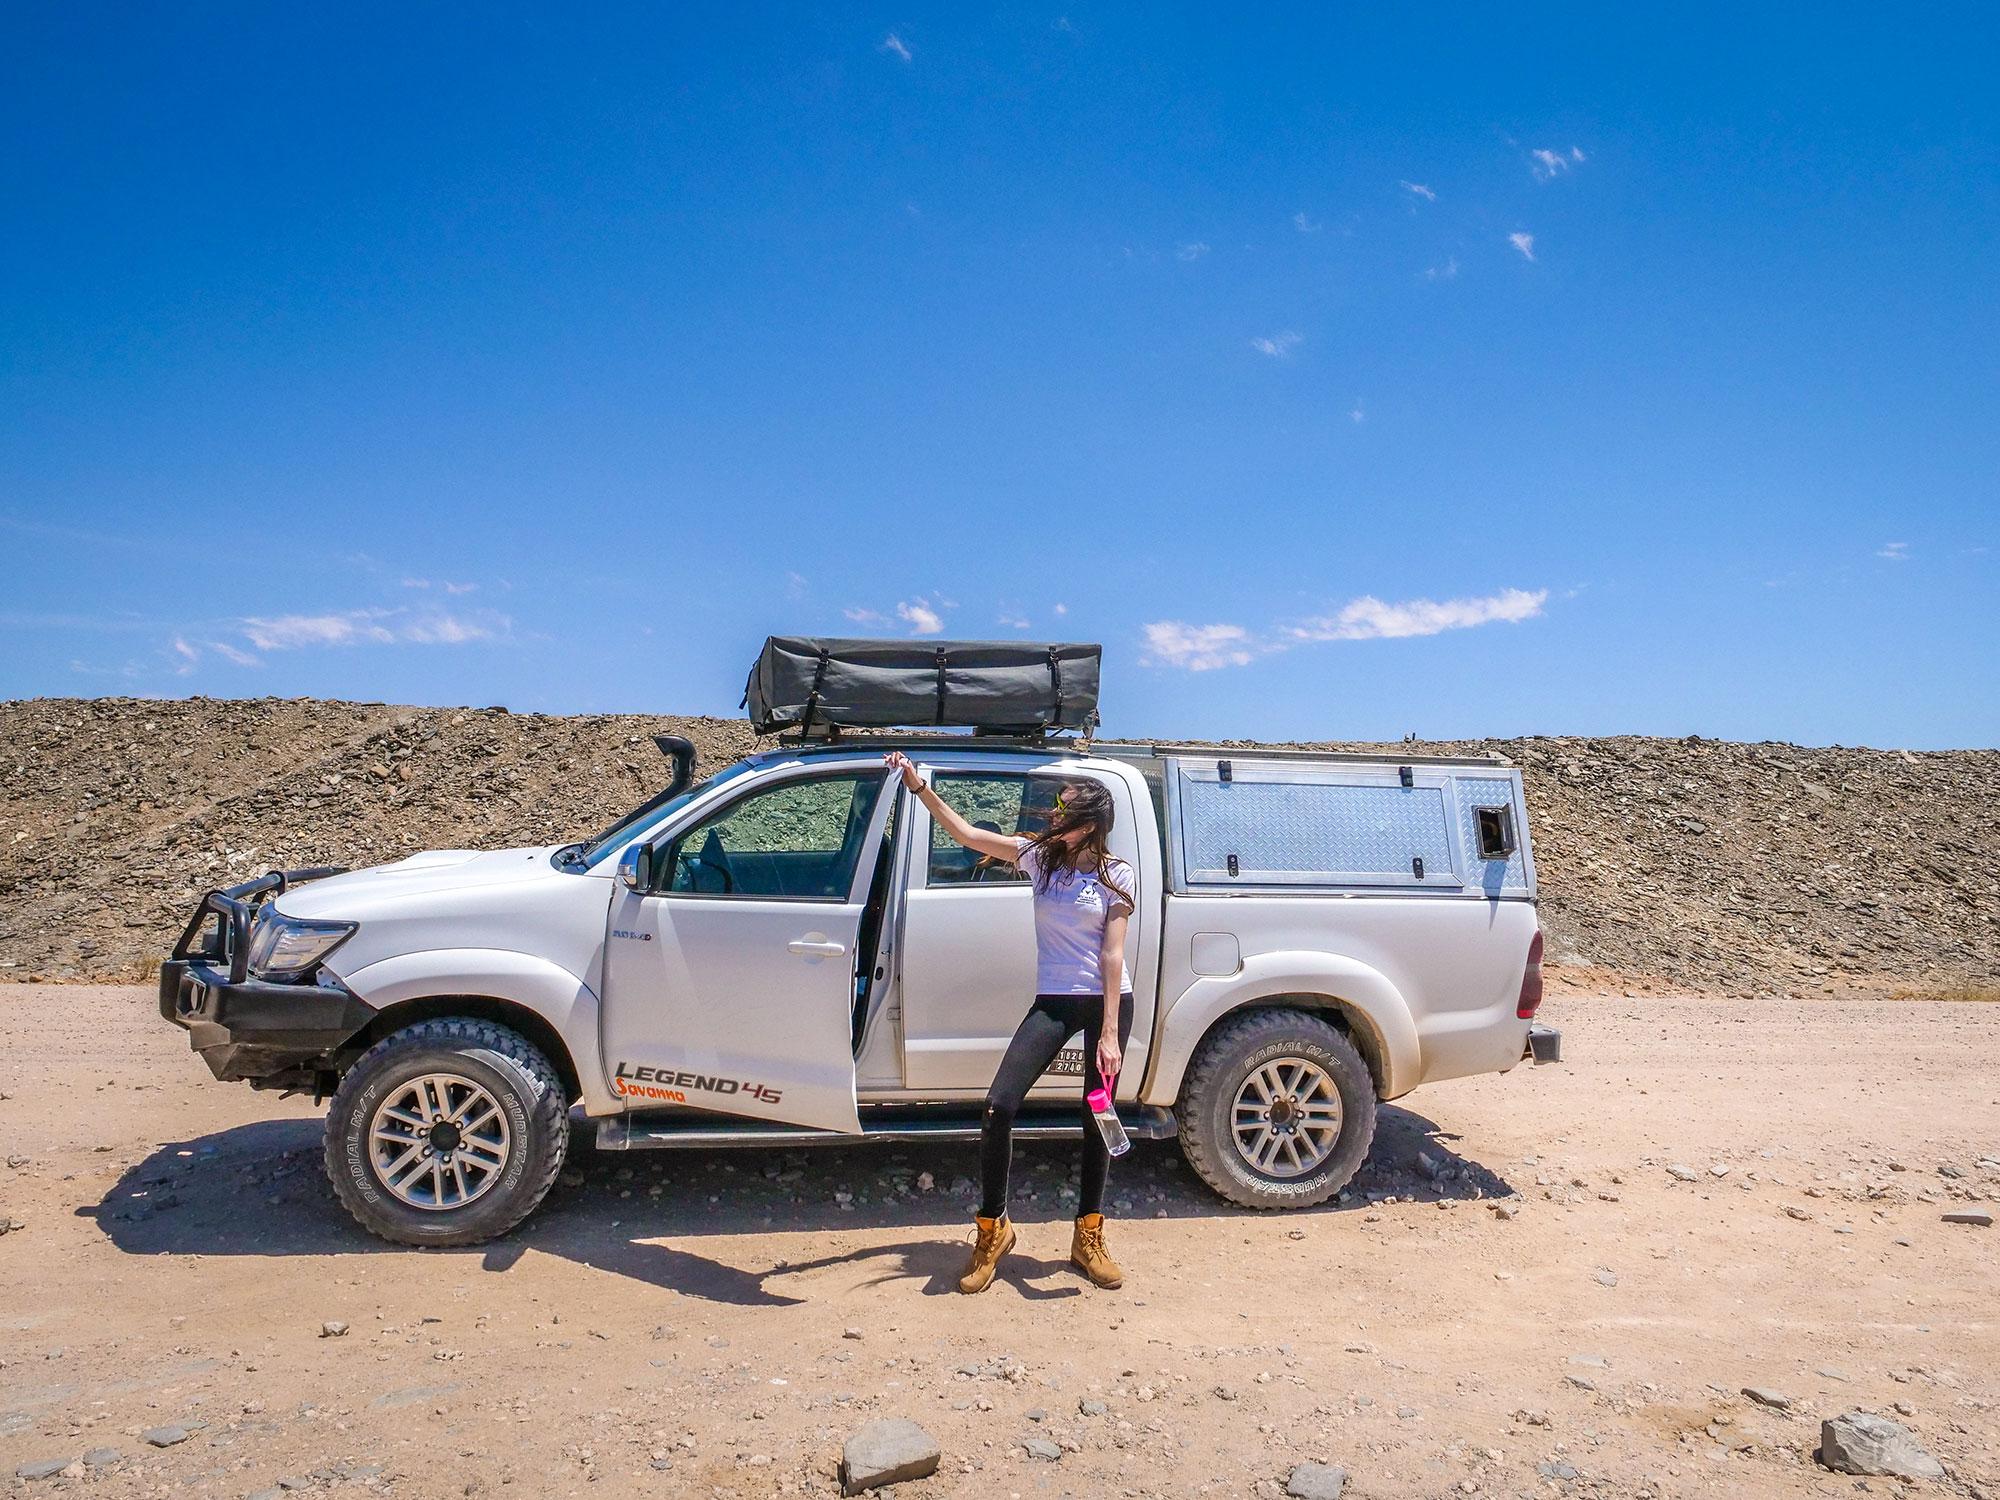 Ella and Toyota Hilux self-drive through the Namib Desert, Namibia, Africa